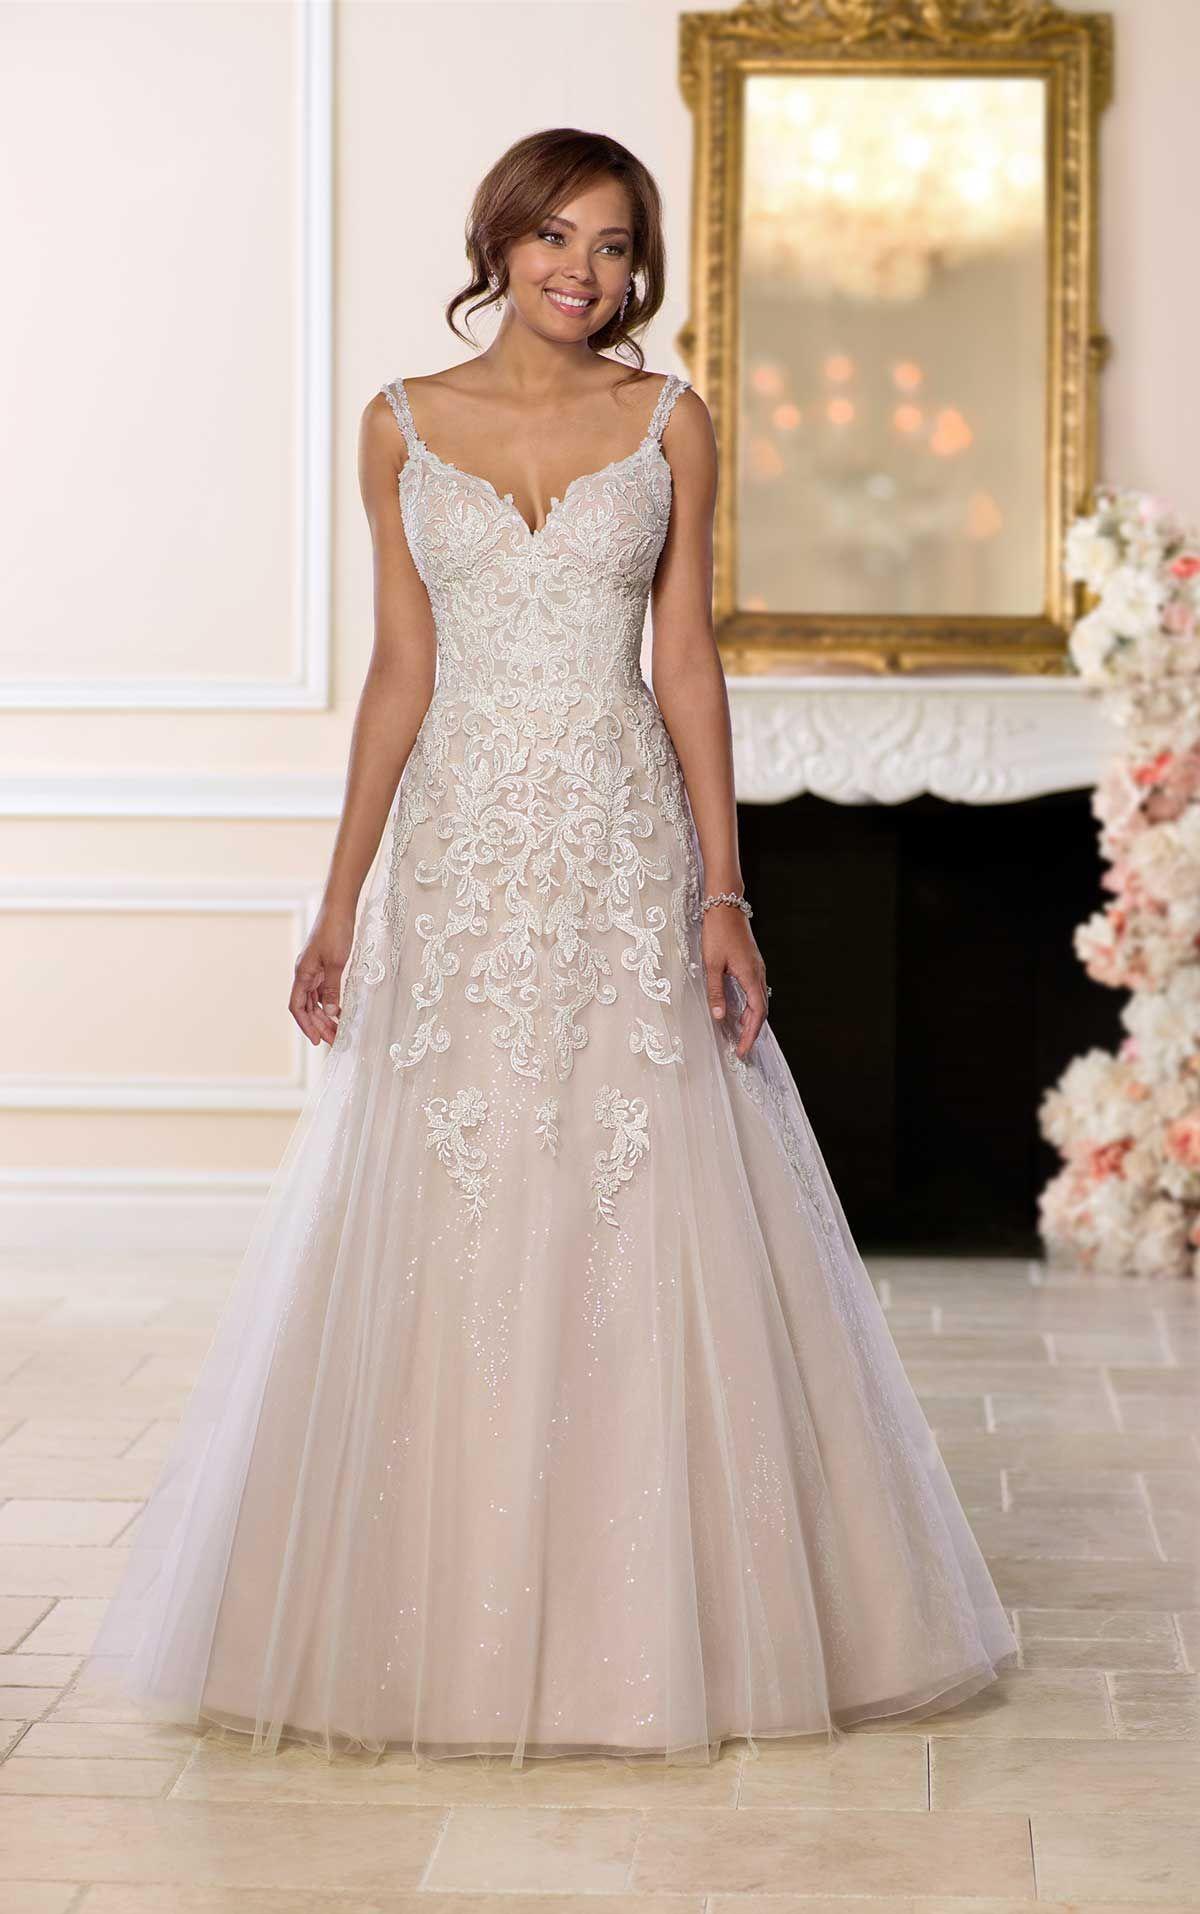 Back detail wedding dress  Open Back Wedding Dress with Beading in   Wedding dresses etc